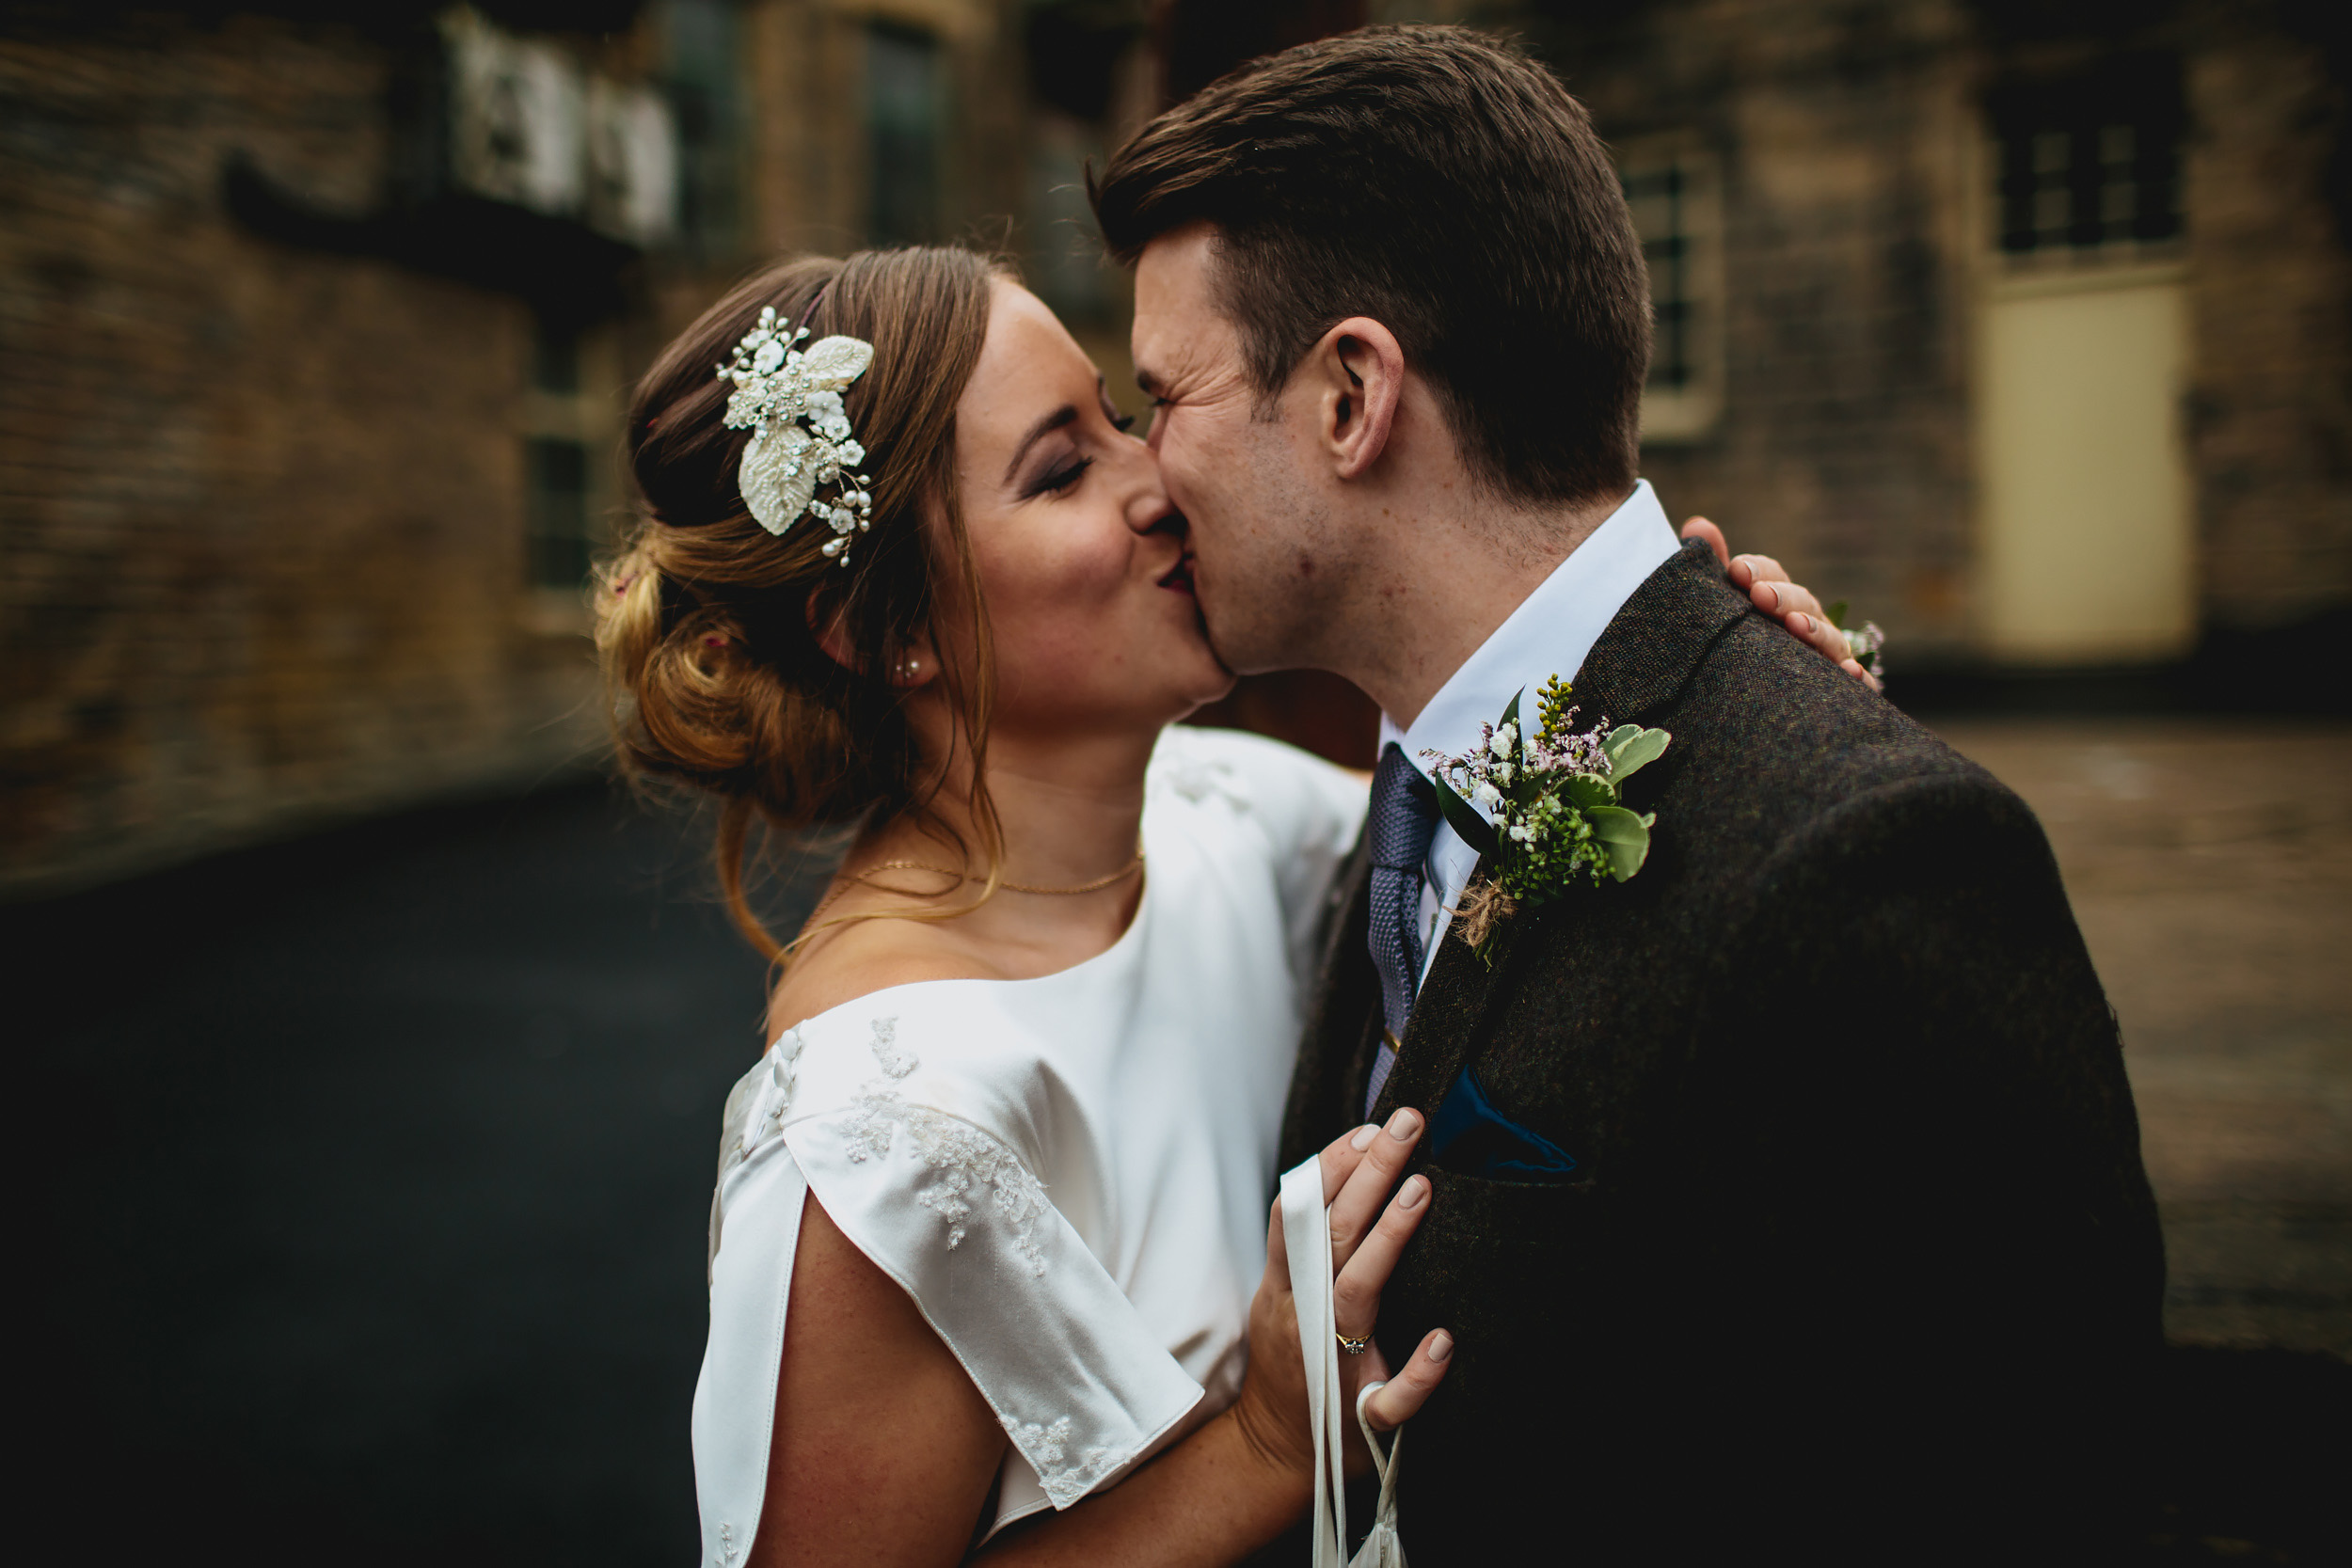 Bride and groom kiss at Sunny Bank Mills Leeds